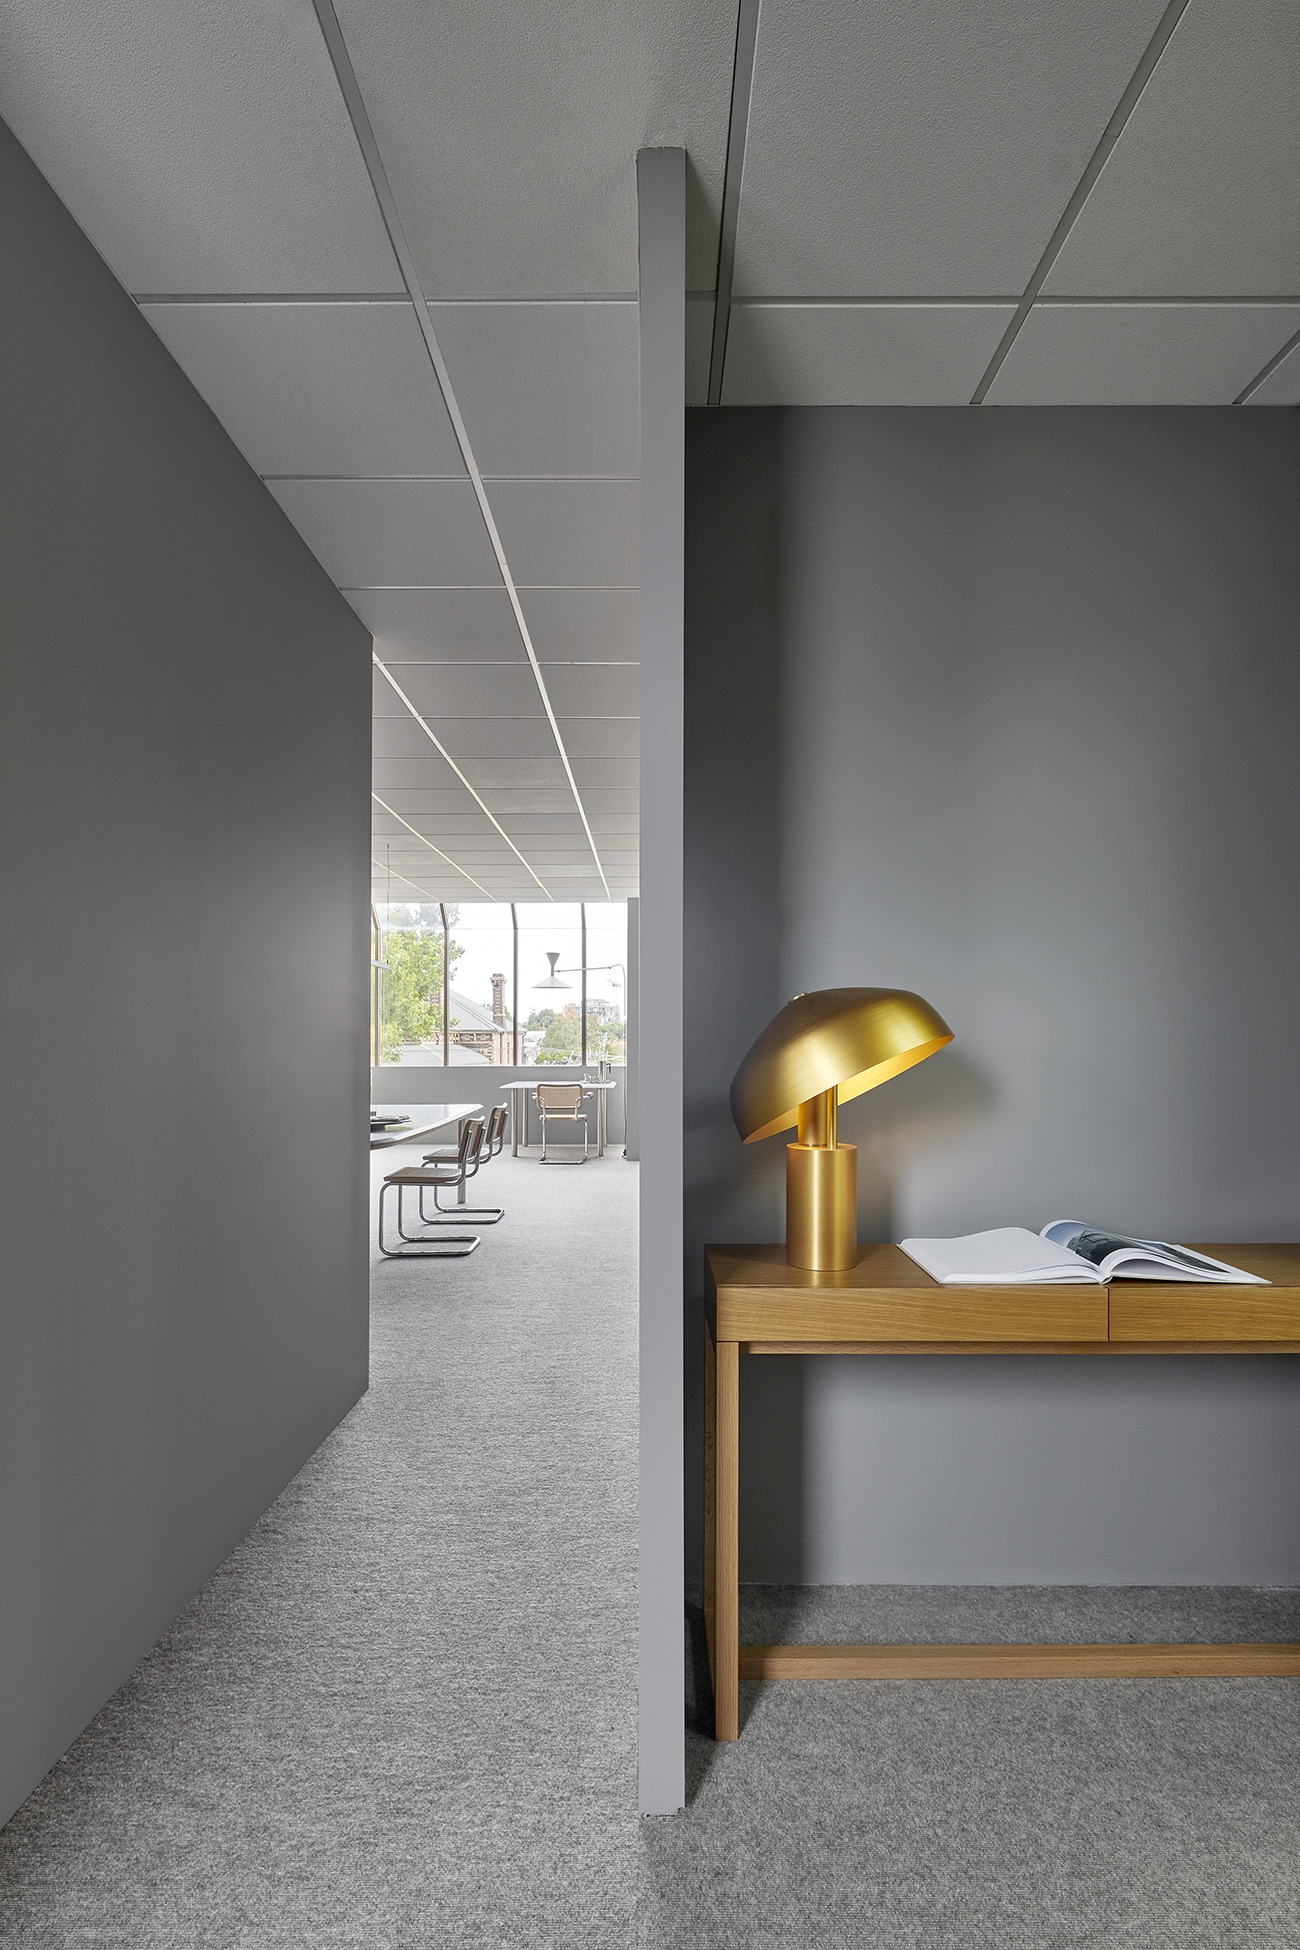 davidov-architects-studio-office-13